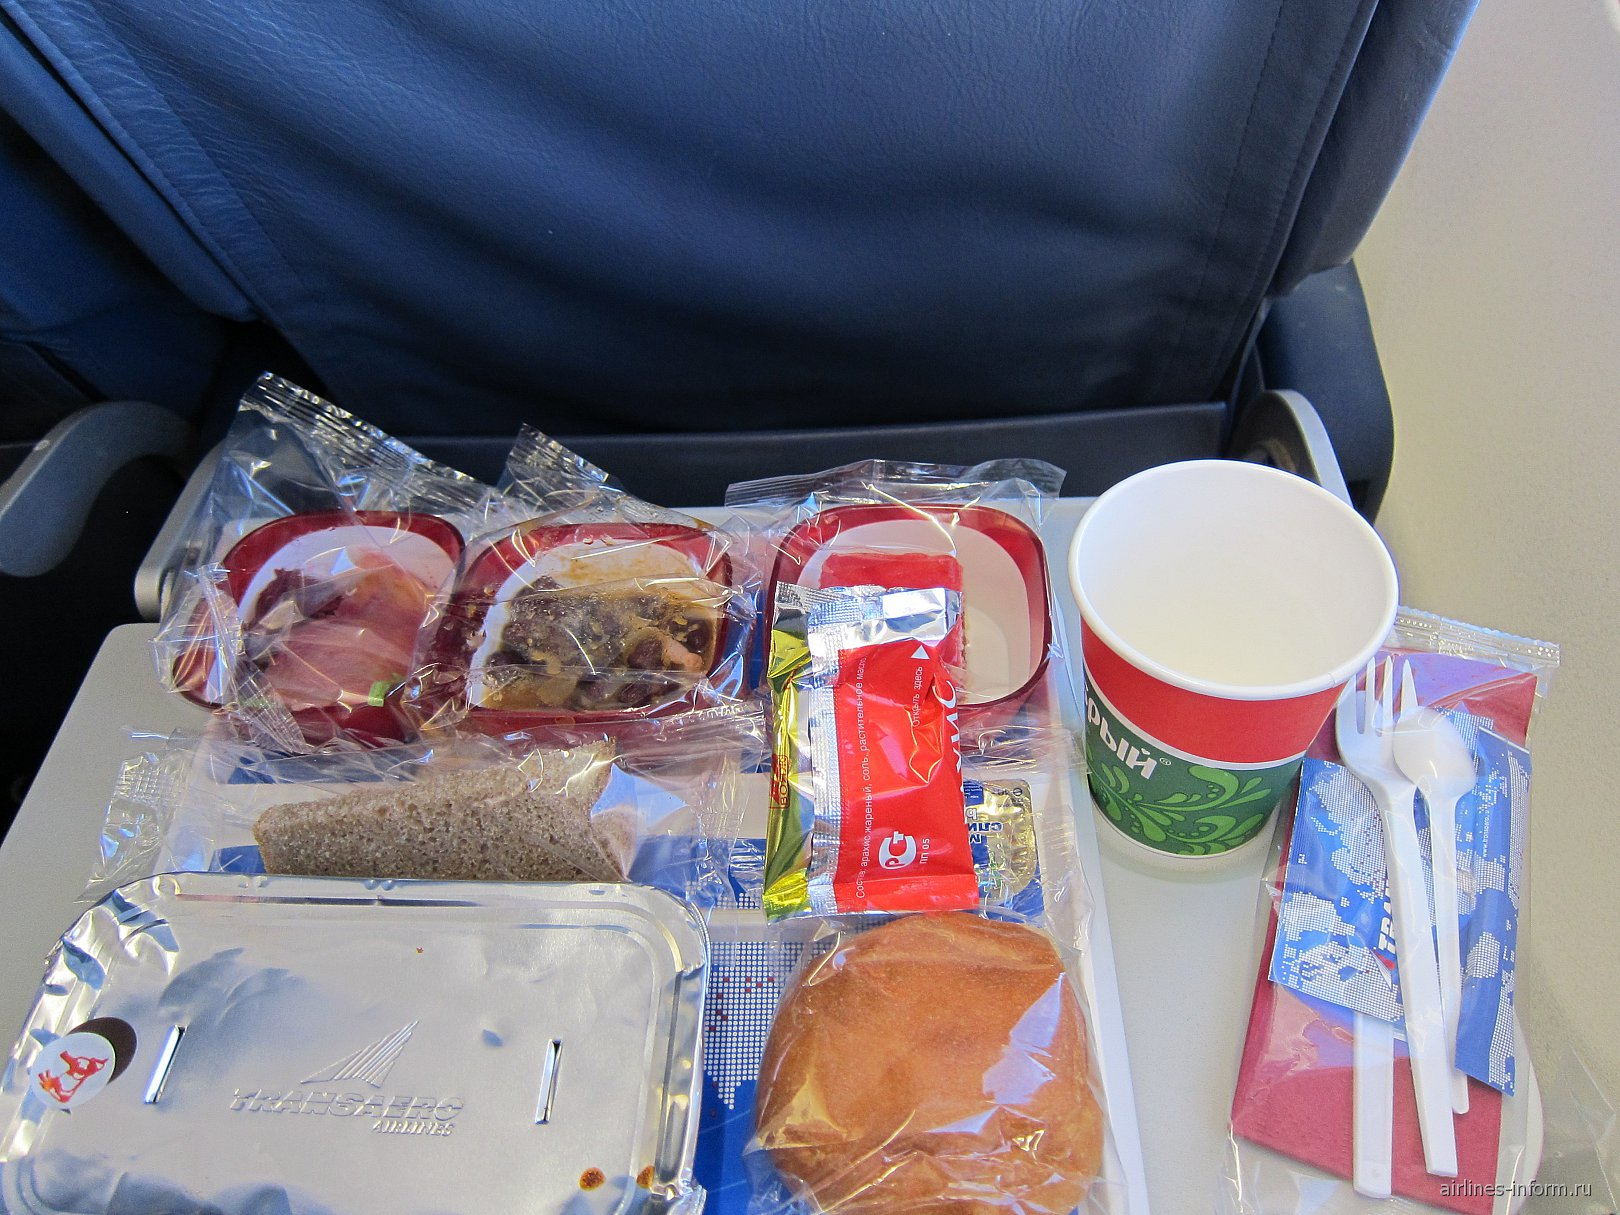 Питание на рейсе Москва-Франкфурт авиакомпании Трансаэро